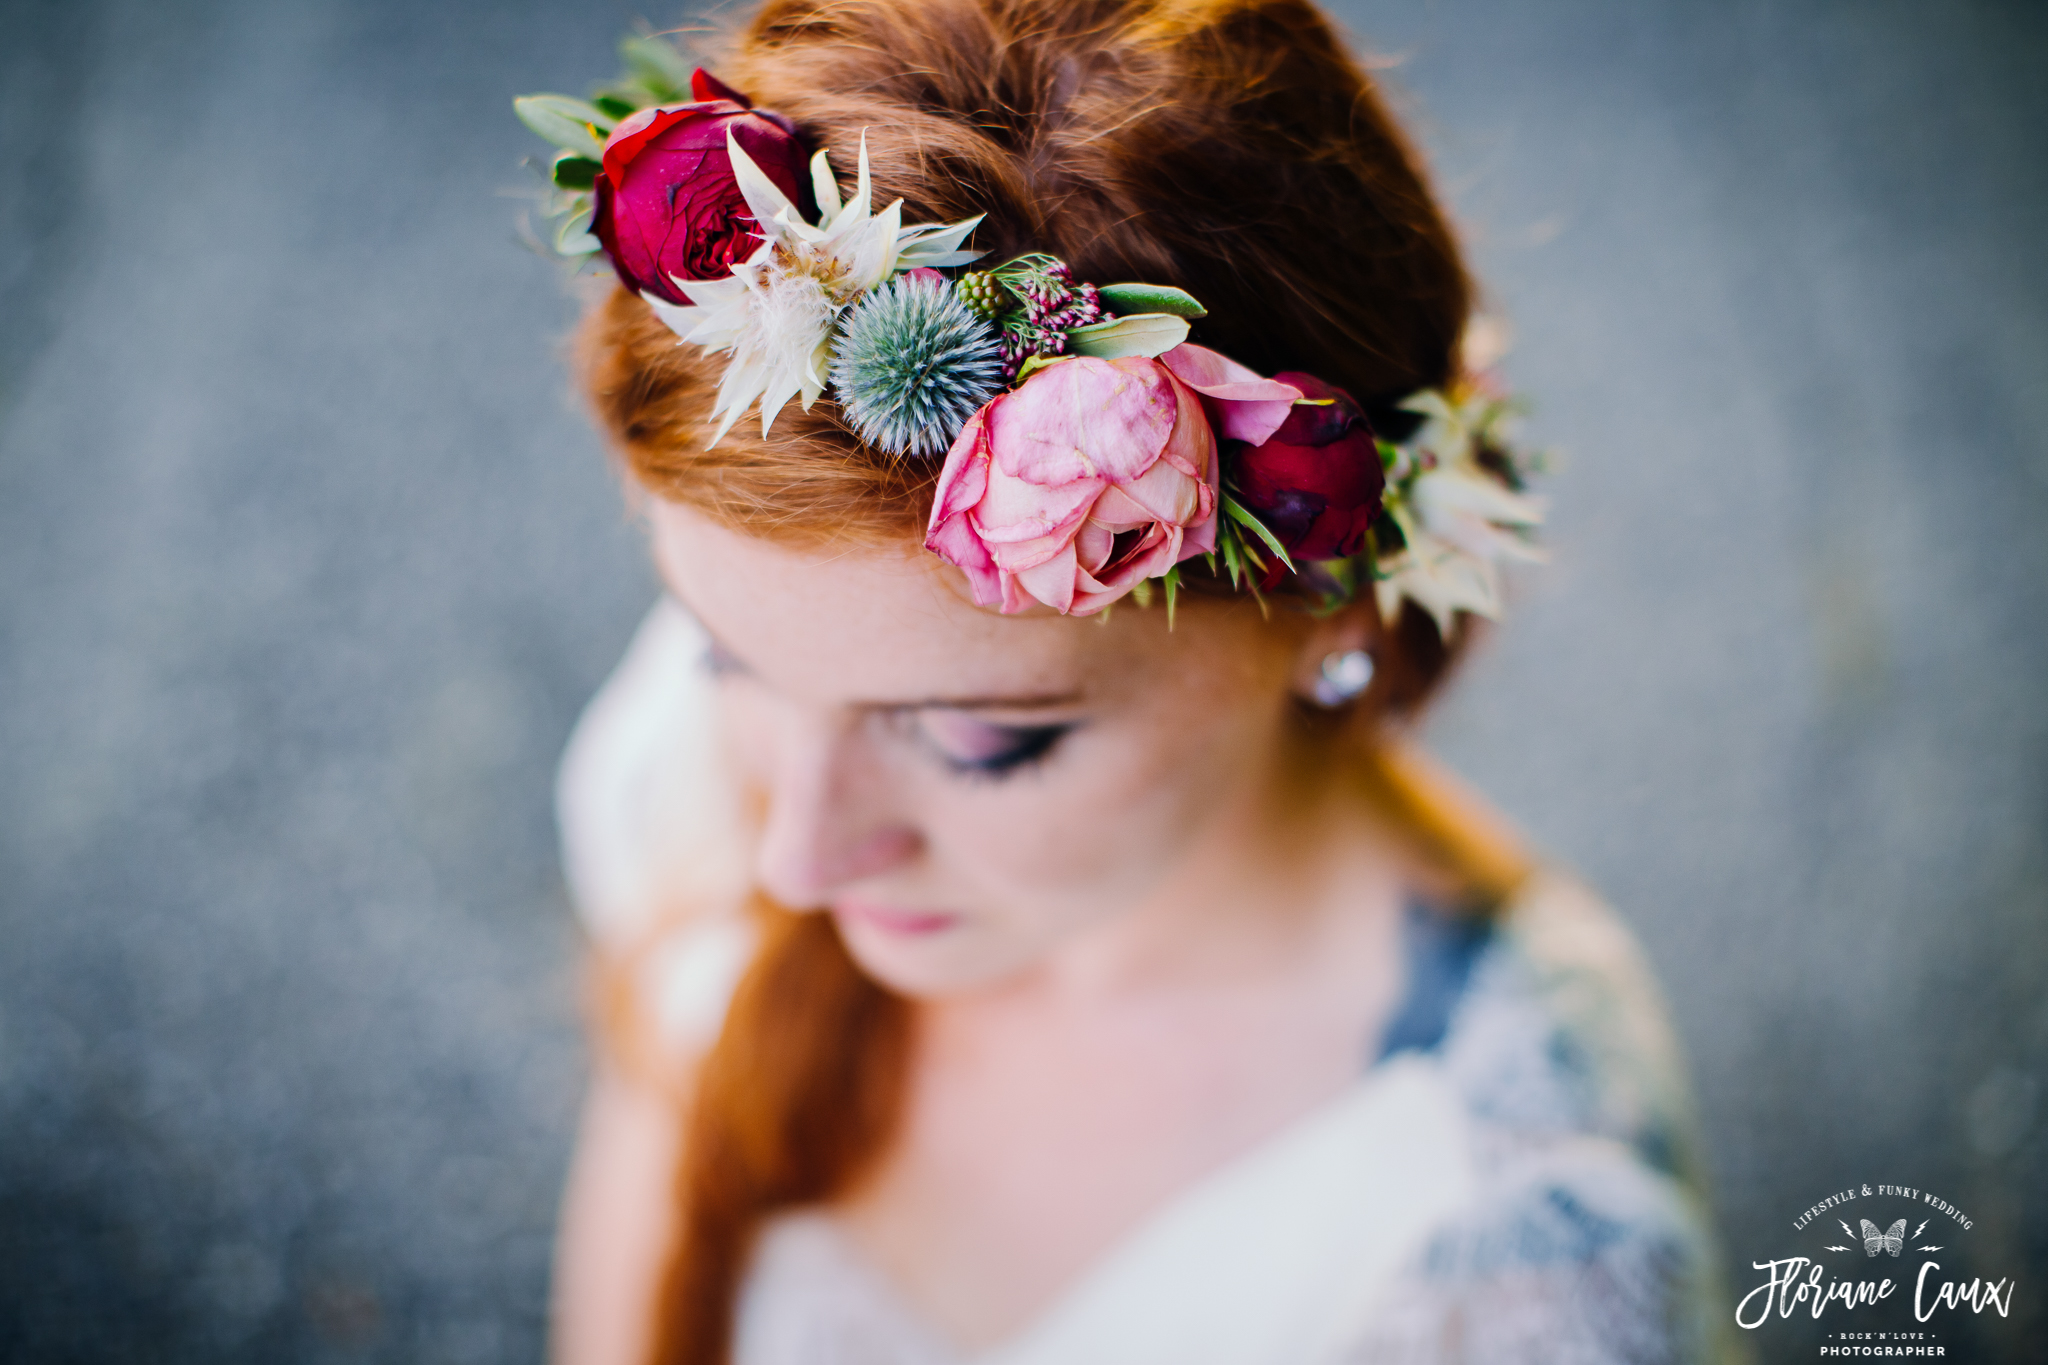 photographe-mariage-toulouse-rocknroll-maries-tatoues-floriane-caux-73